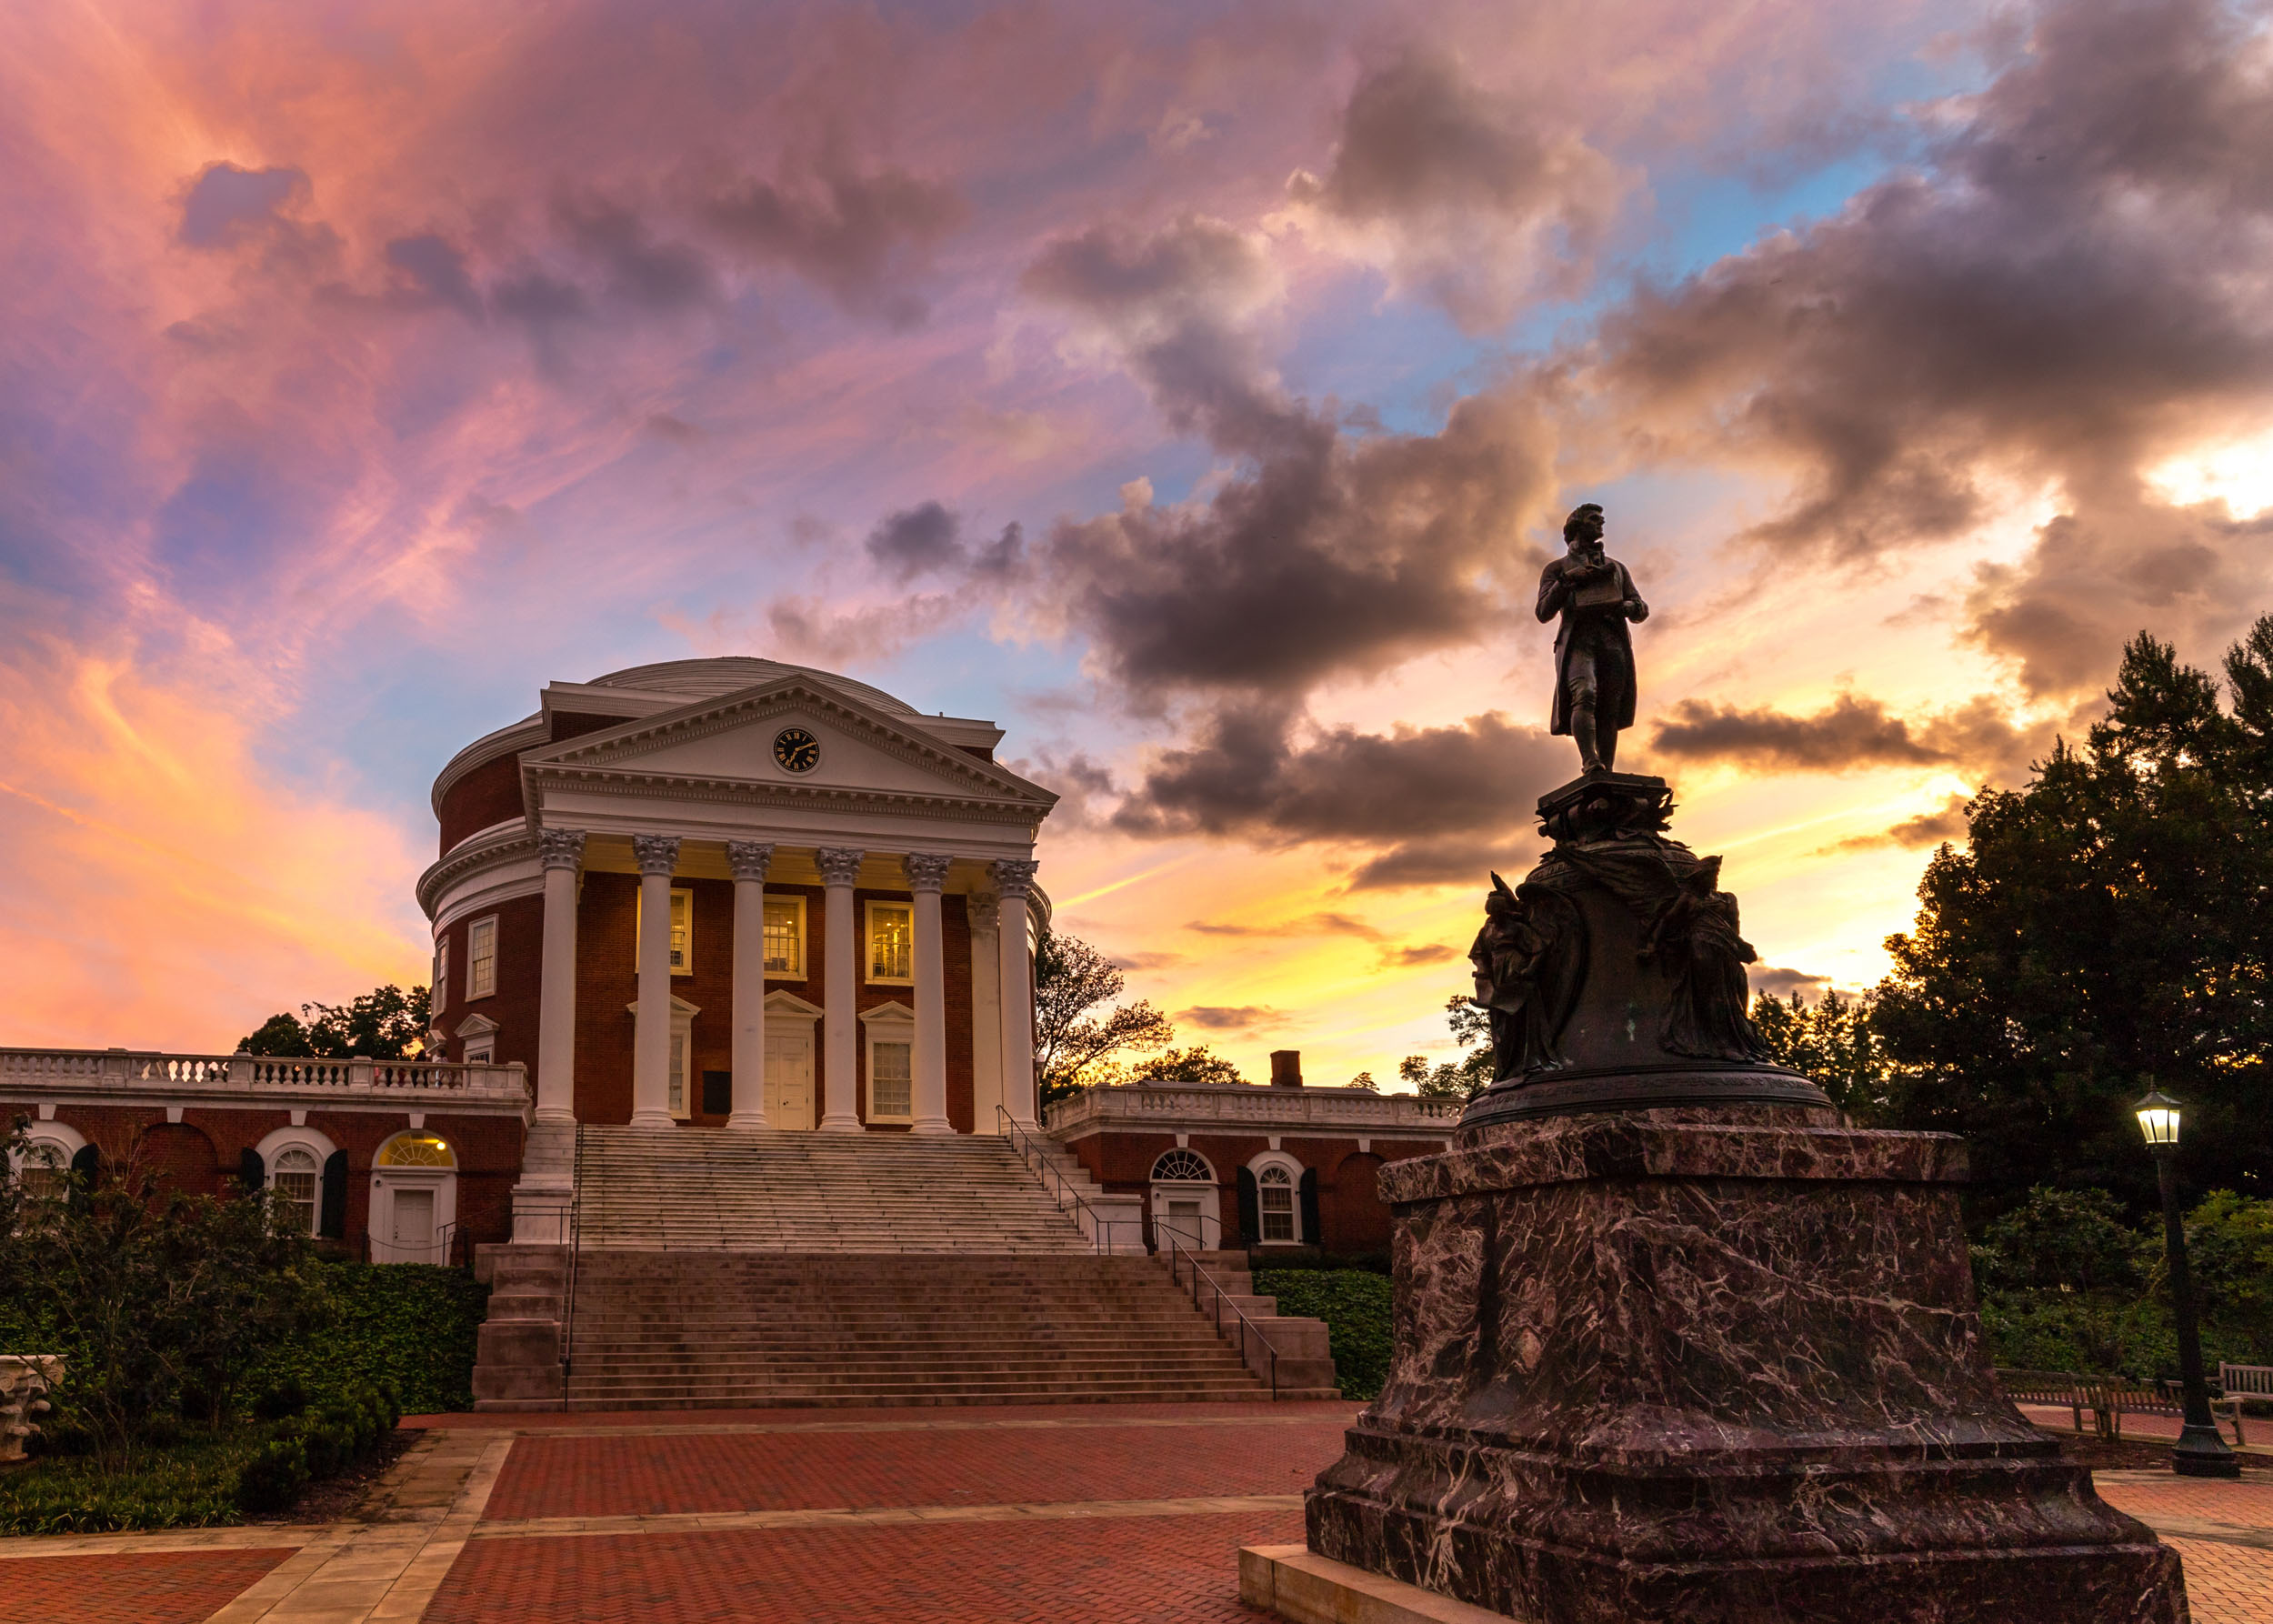 Crane's Instagram account presents a rainbow of UVA skies to its followers. (Photo by Joshua Crane)